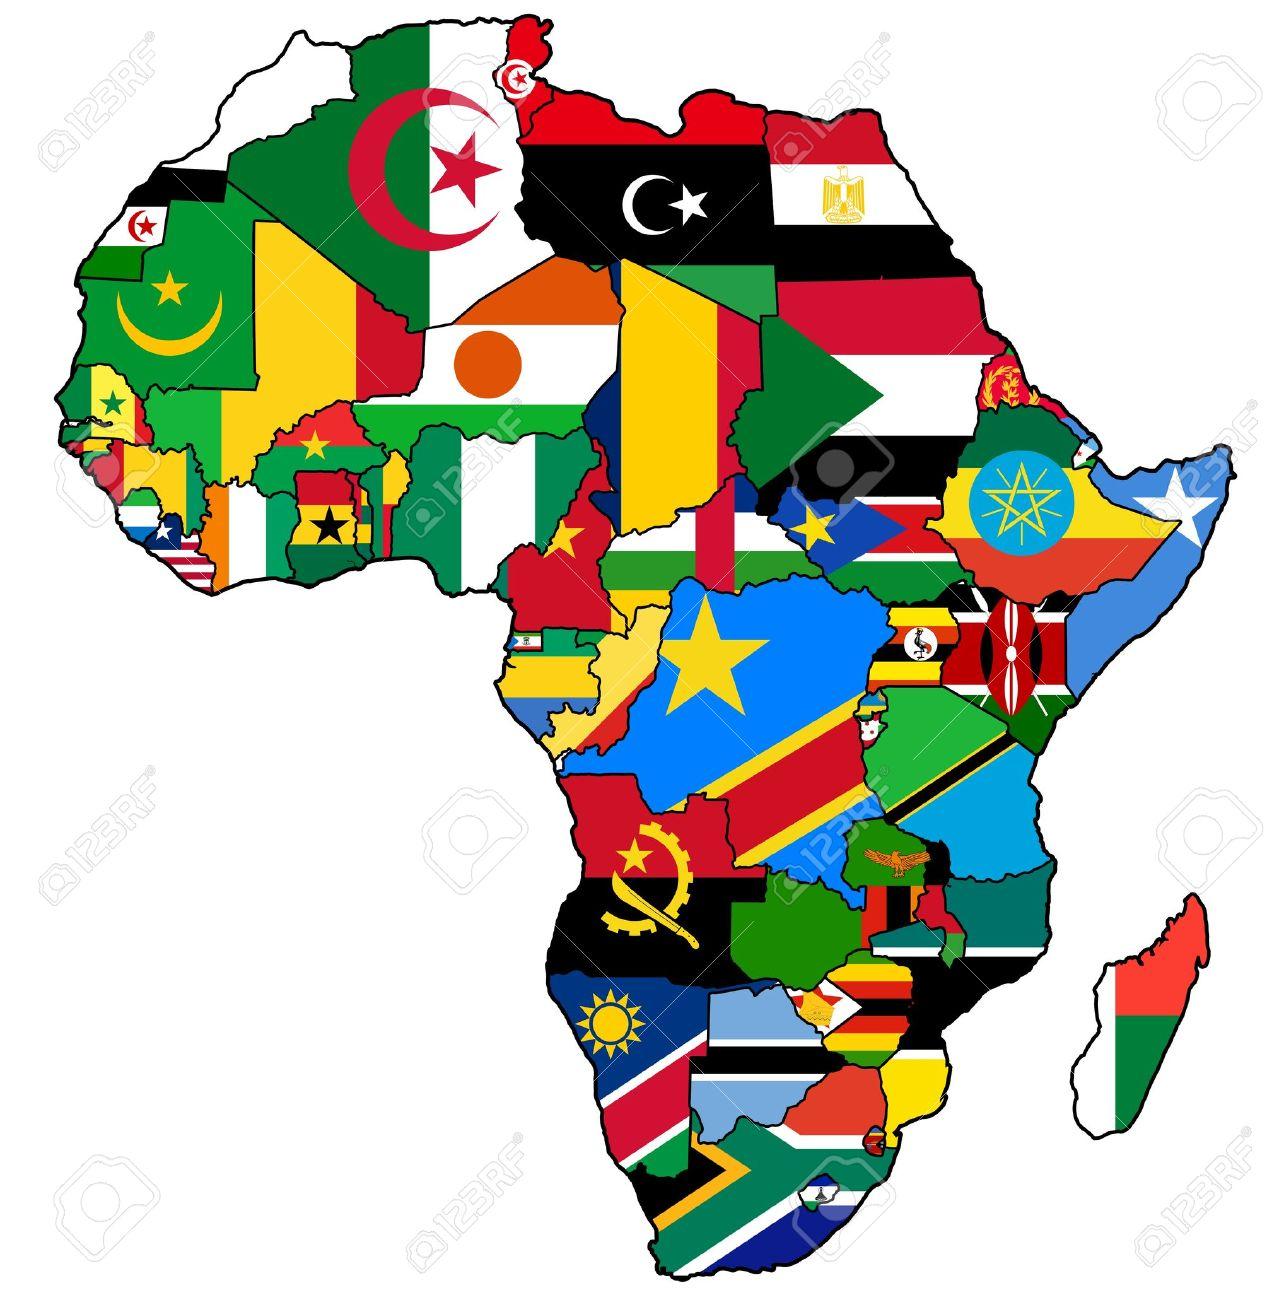 Resultado de imagen para mapa union africana